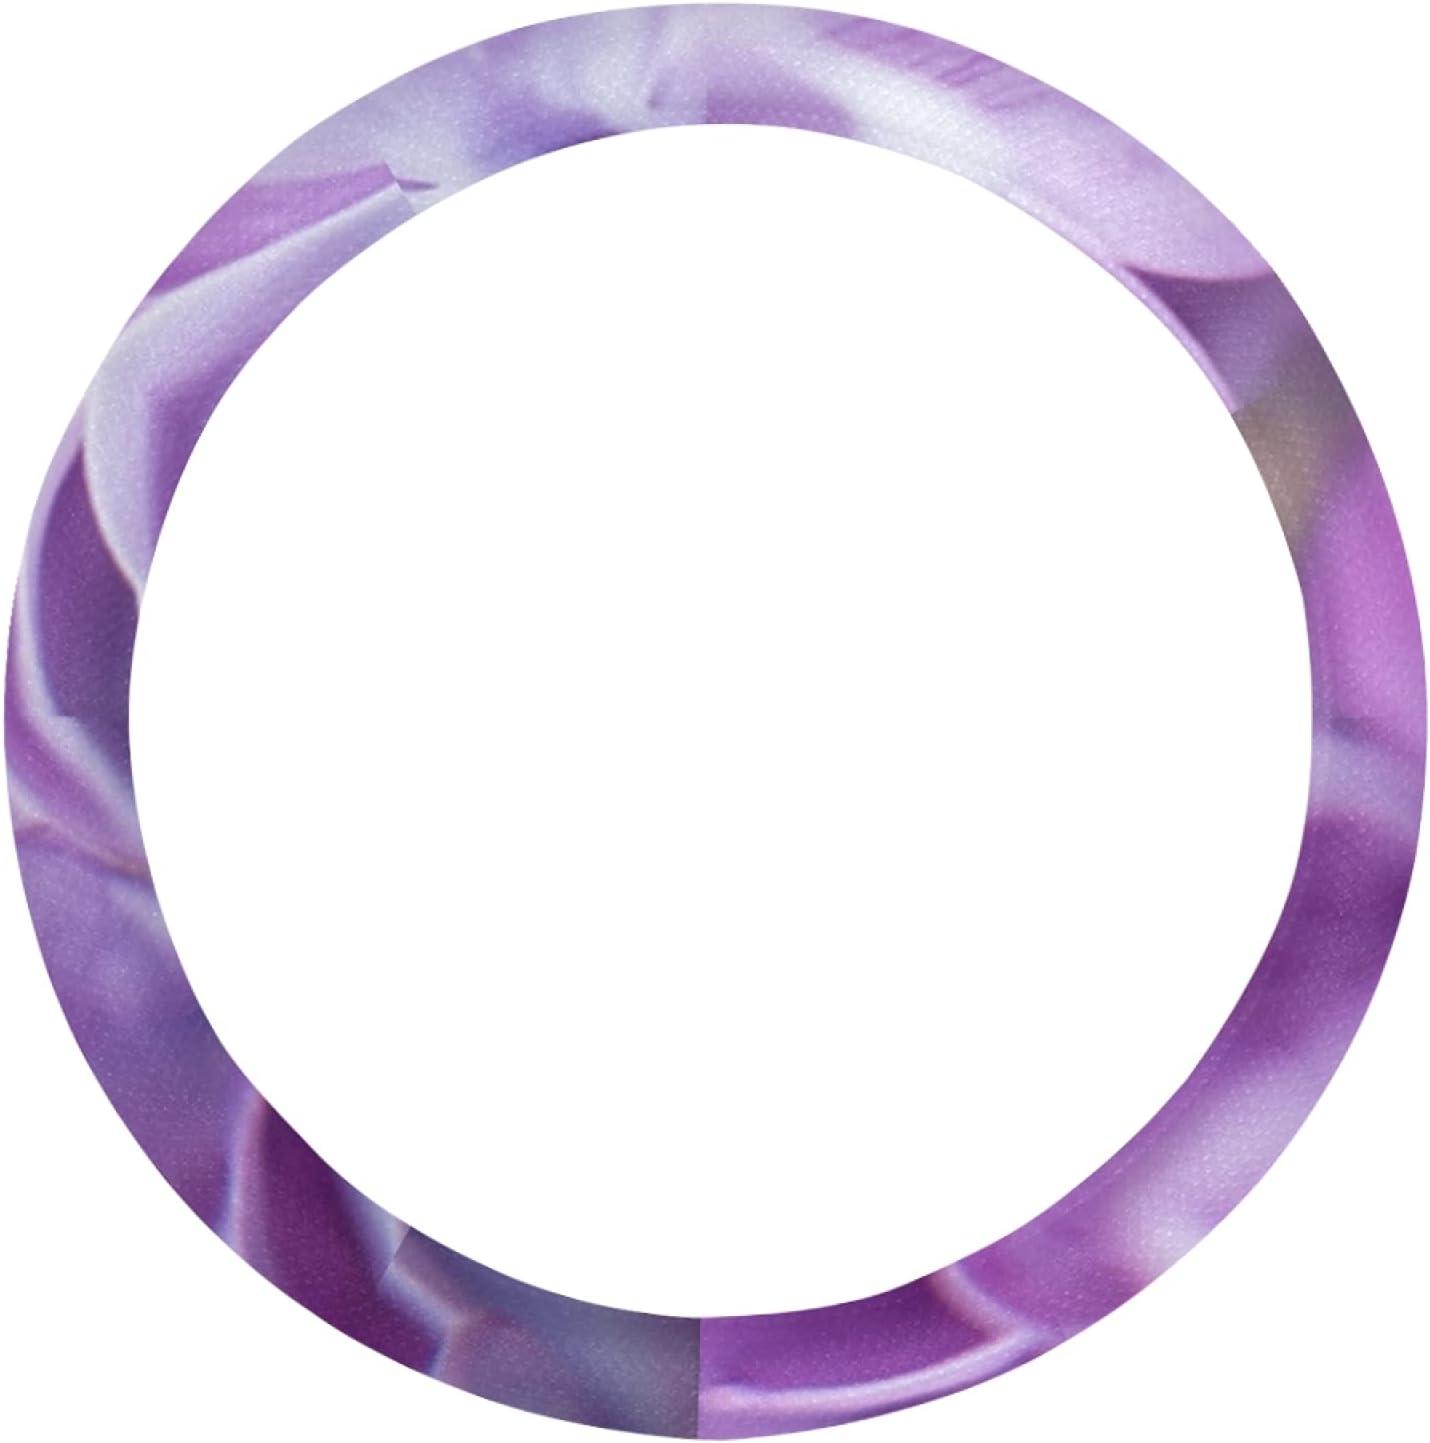 AIKENING Steering Wheel Covers Max 49% OFF for Purple Flo Lilac Violet Women Philadelphia Mall